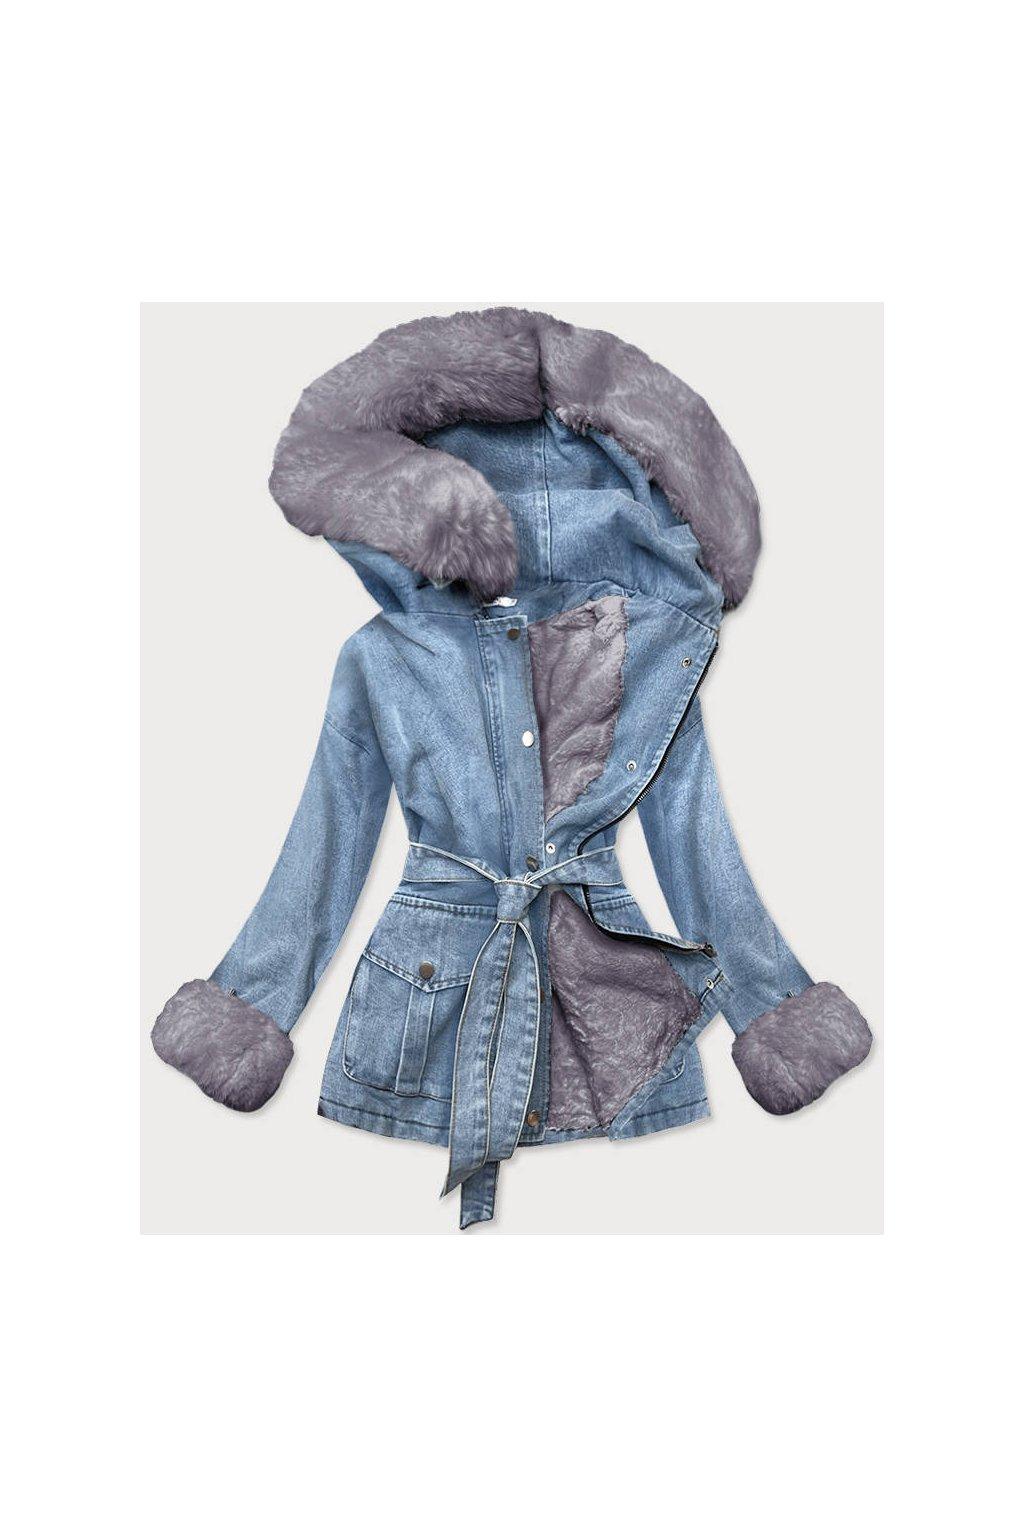 Dámska zimná rifľová bunda s  kožušinou 9026 modrošedá